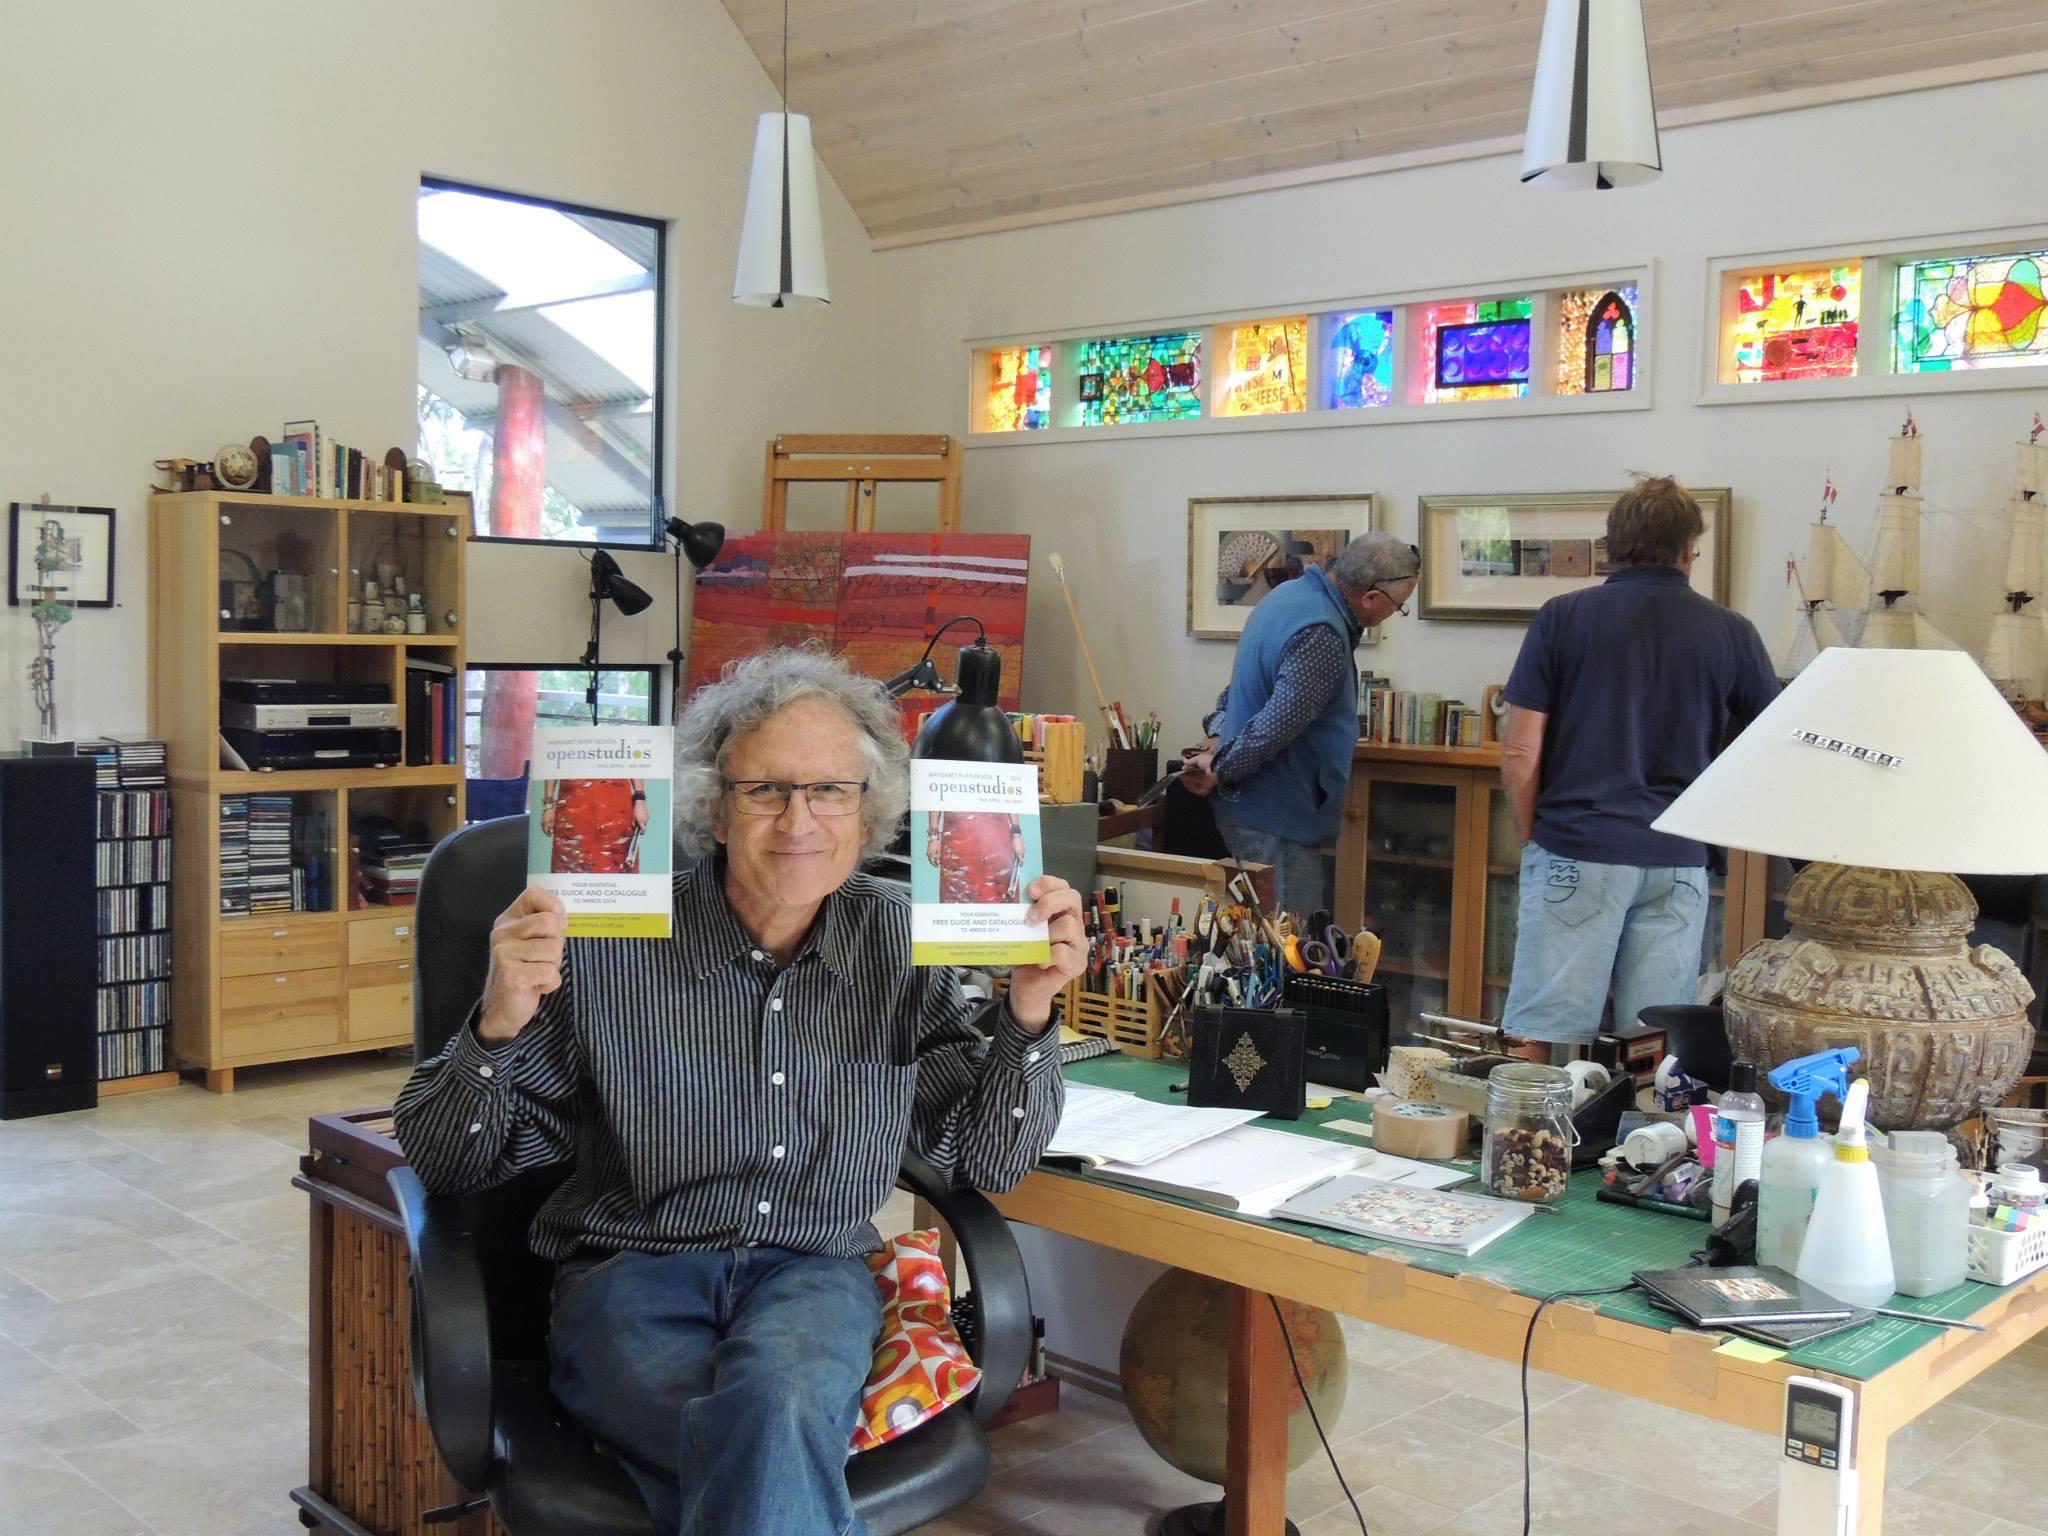 Leon Pericles Margaret River Region Open Studios